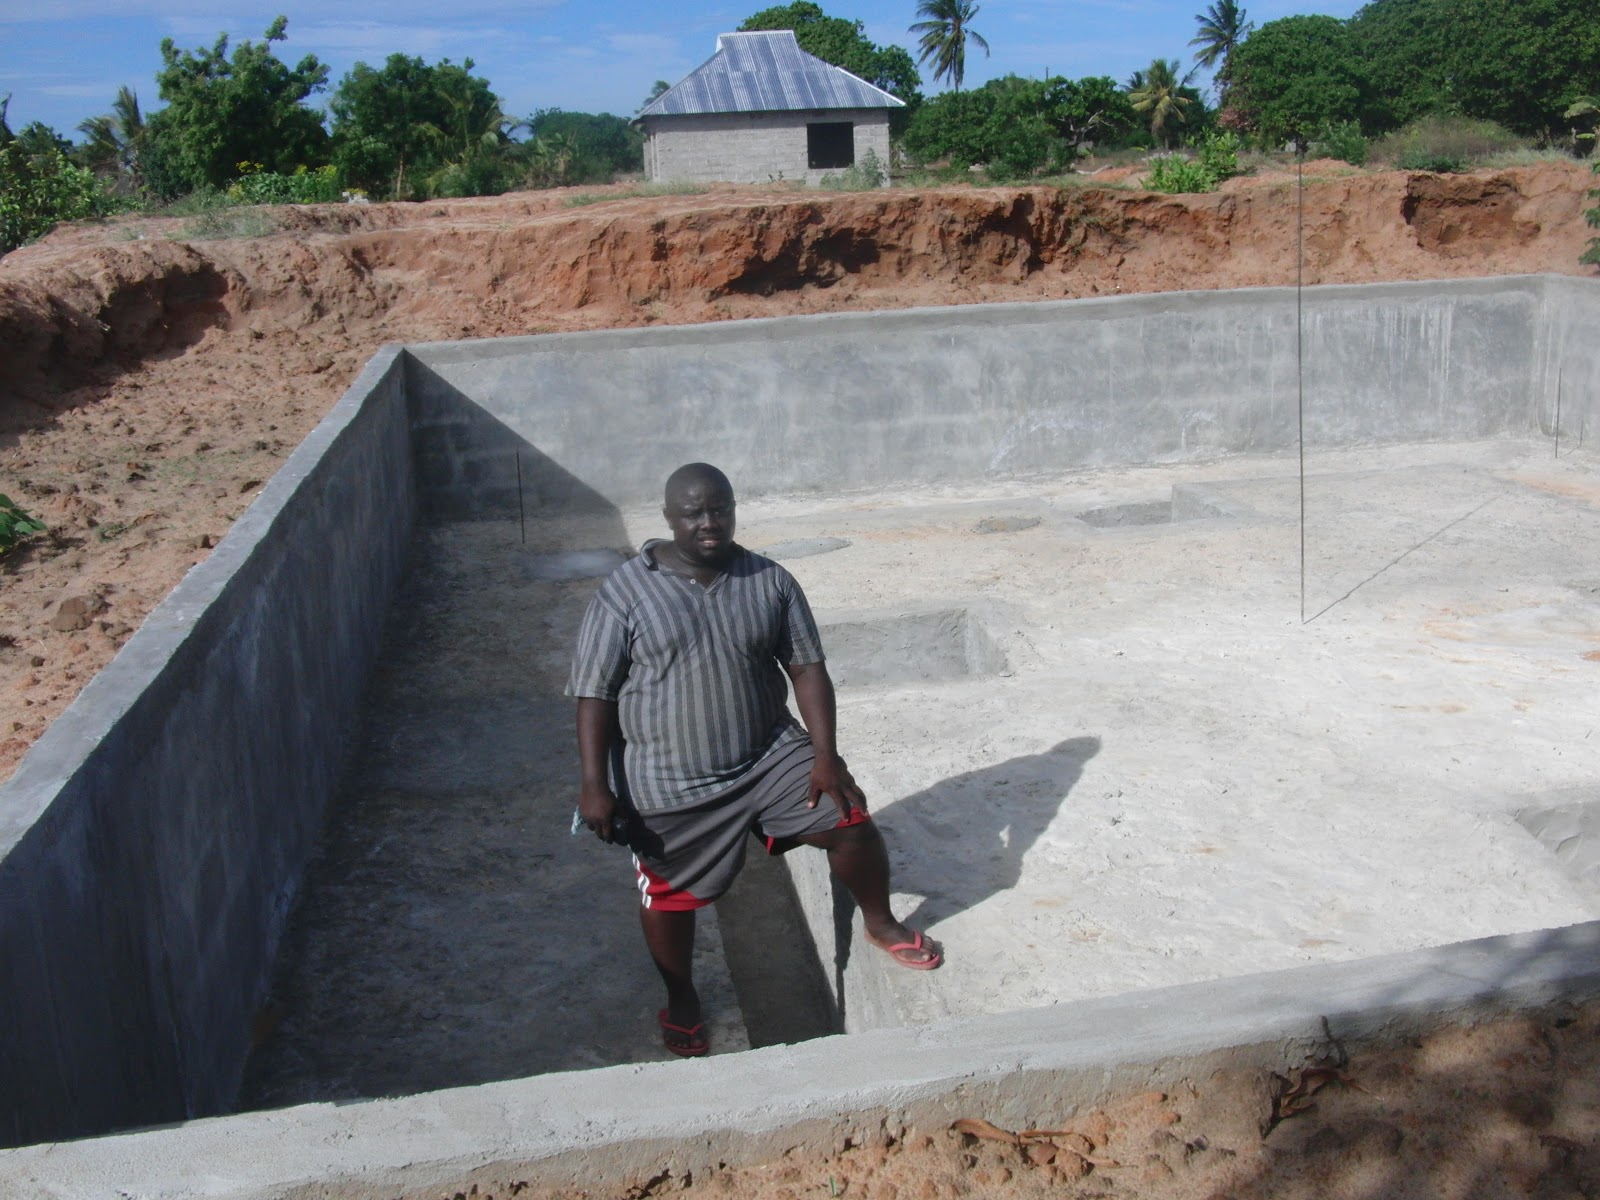 Amisodago consultancy firm concrete fish pond at mwongozo for Concrete pond construction